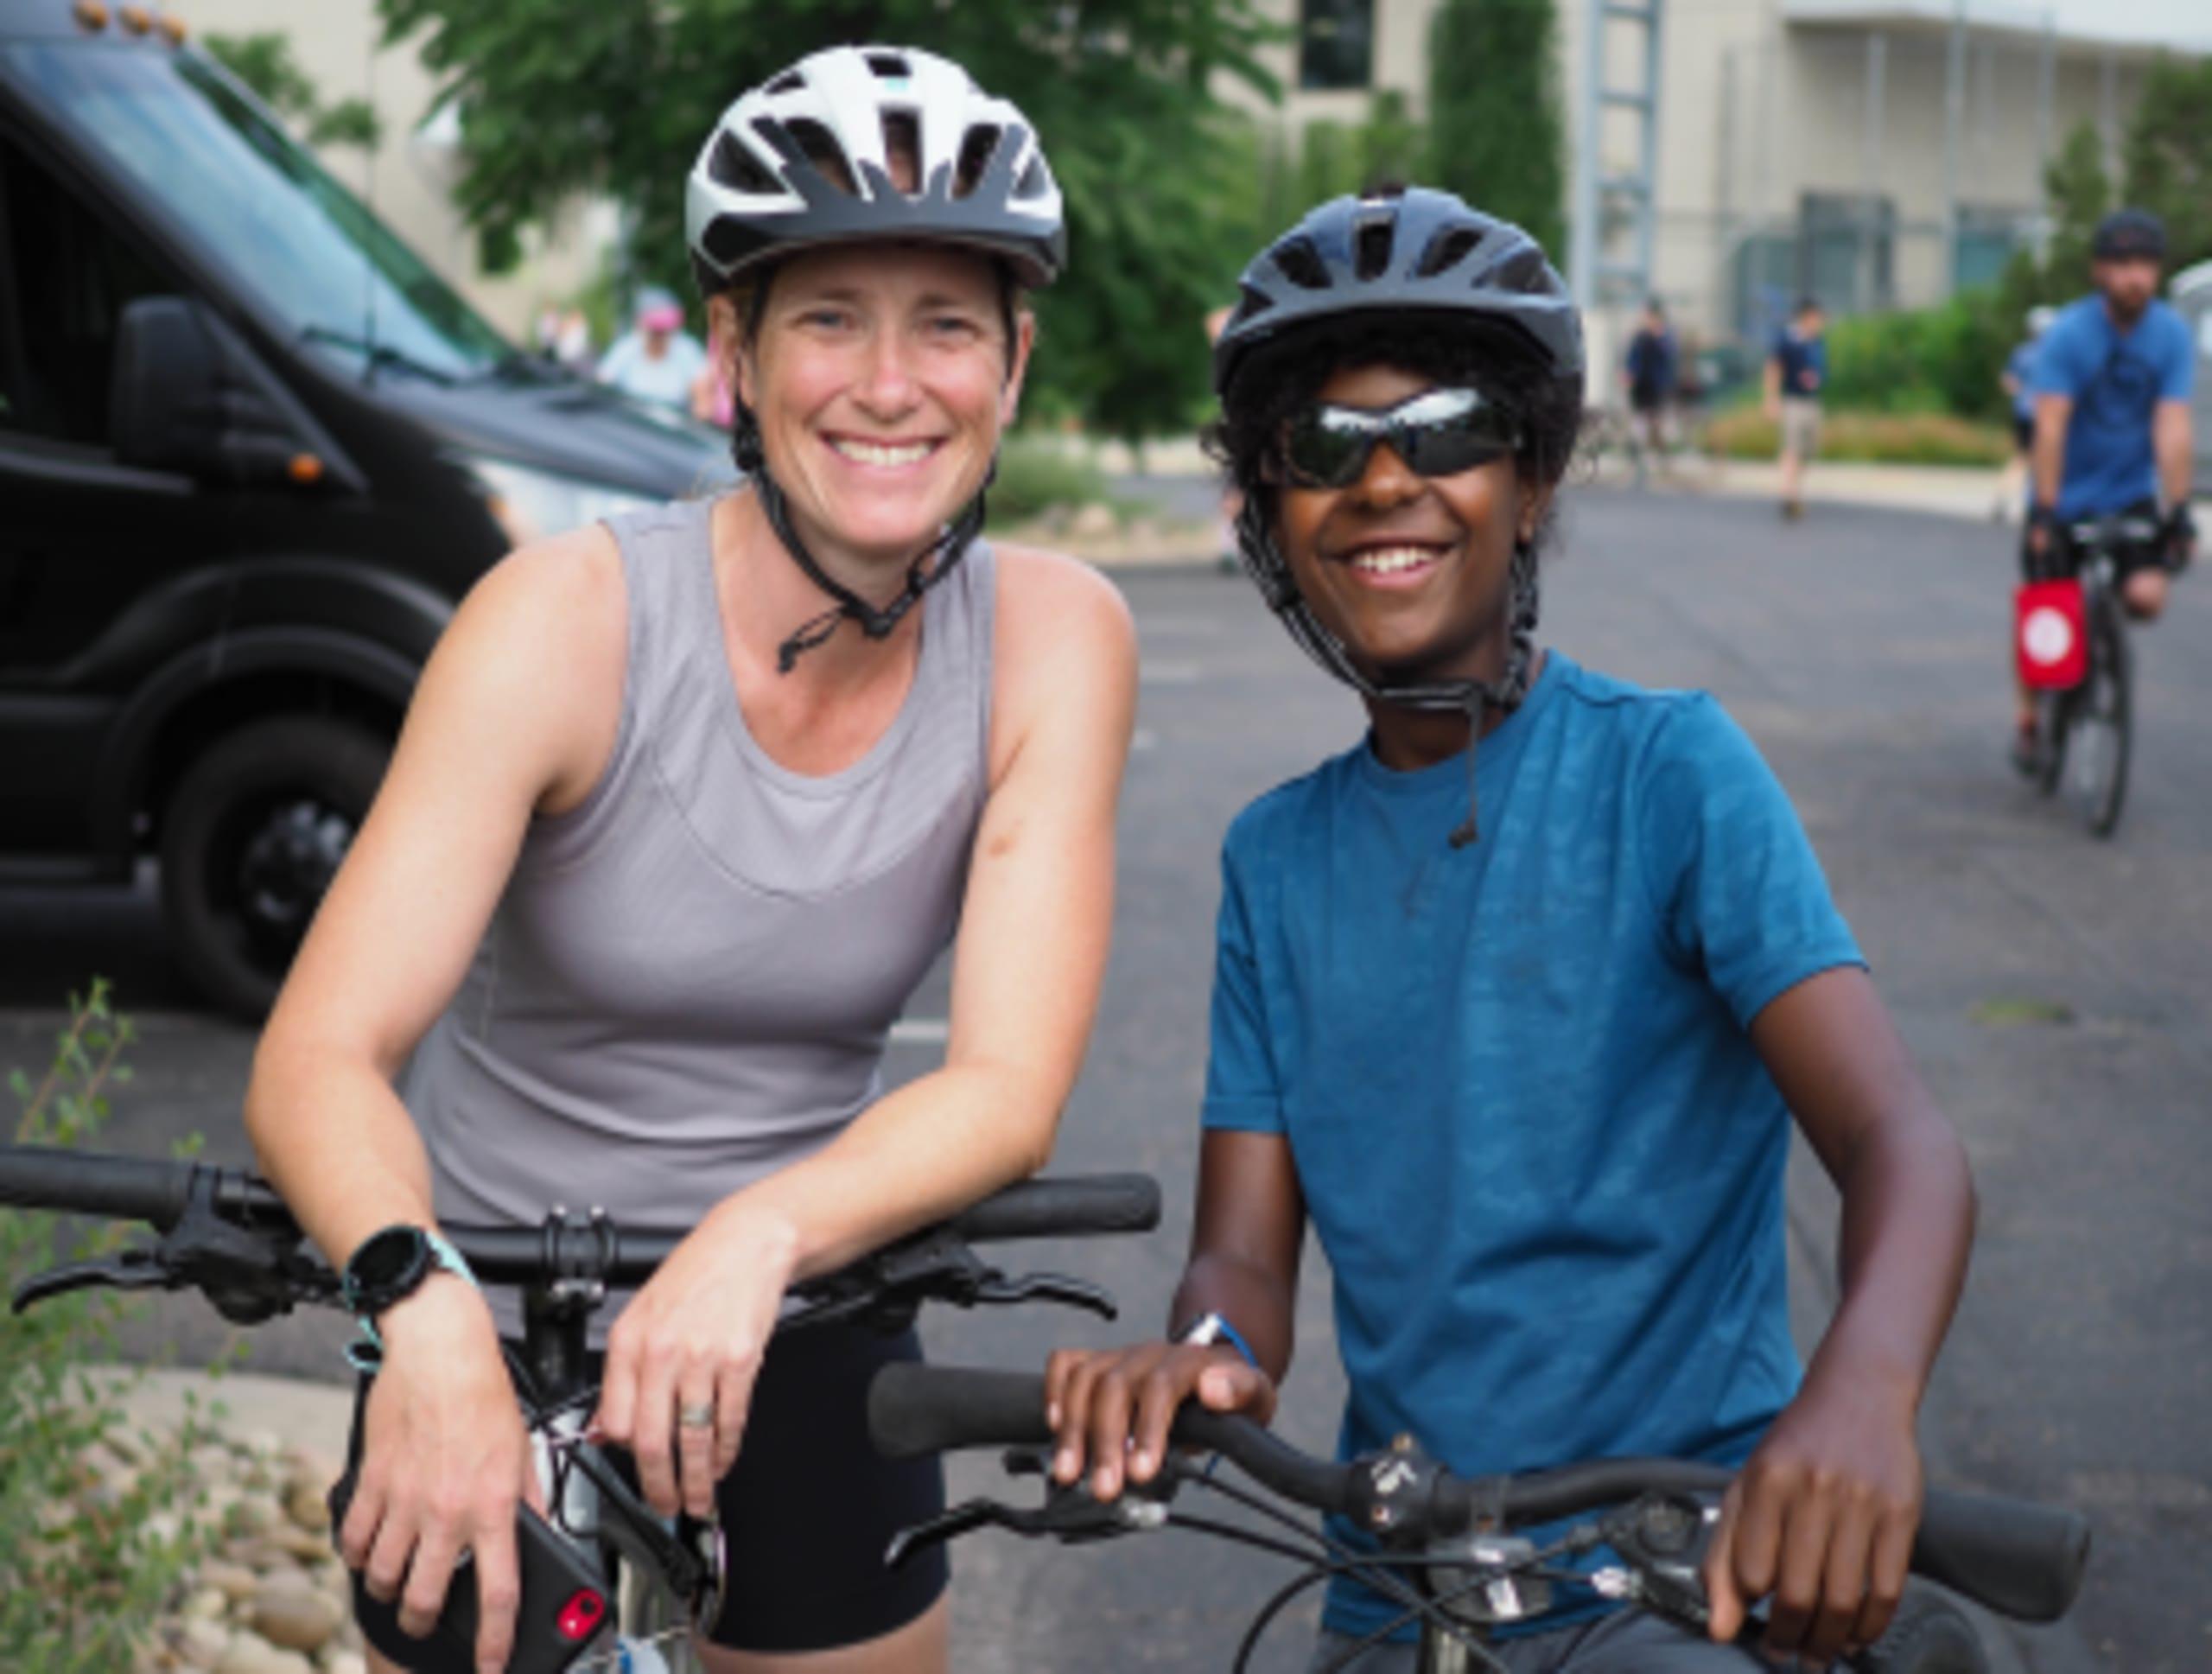 Explore the gravel roads around Fort Collins on the FoCo Fondo bike ride